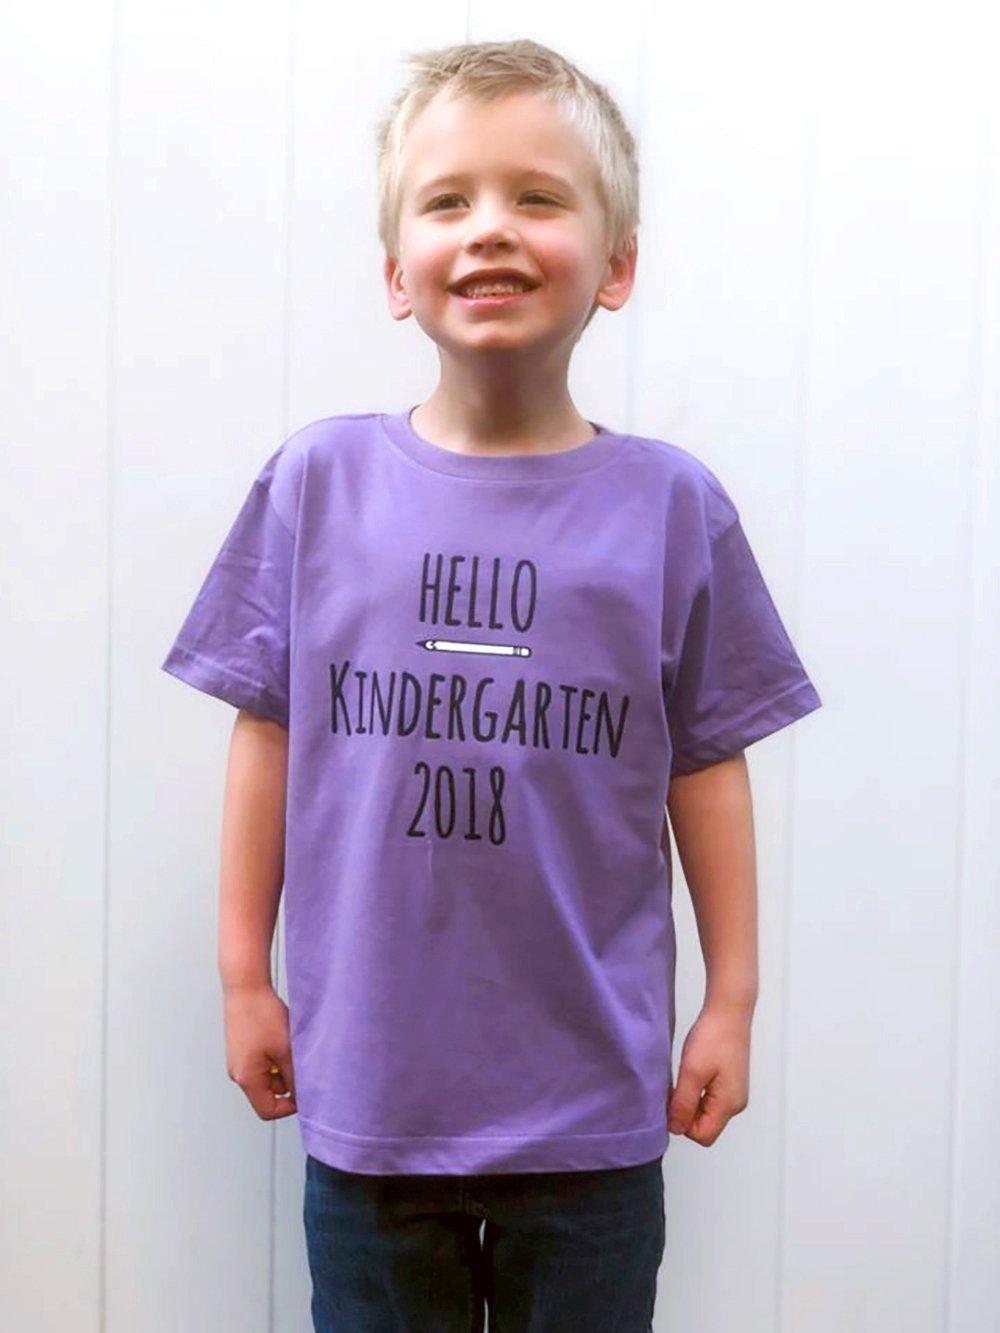 Hello Kindergarten 2018, First Day of School Tshirt for Kids, Short Sleeve, Purple, Size 5/6